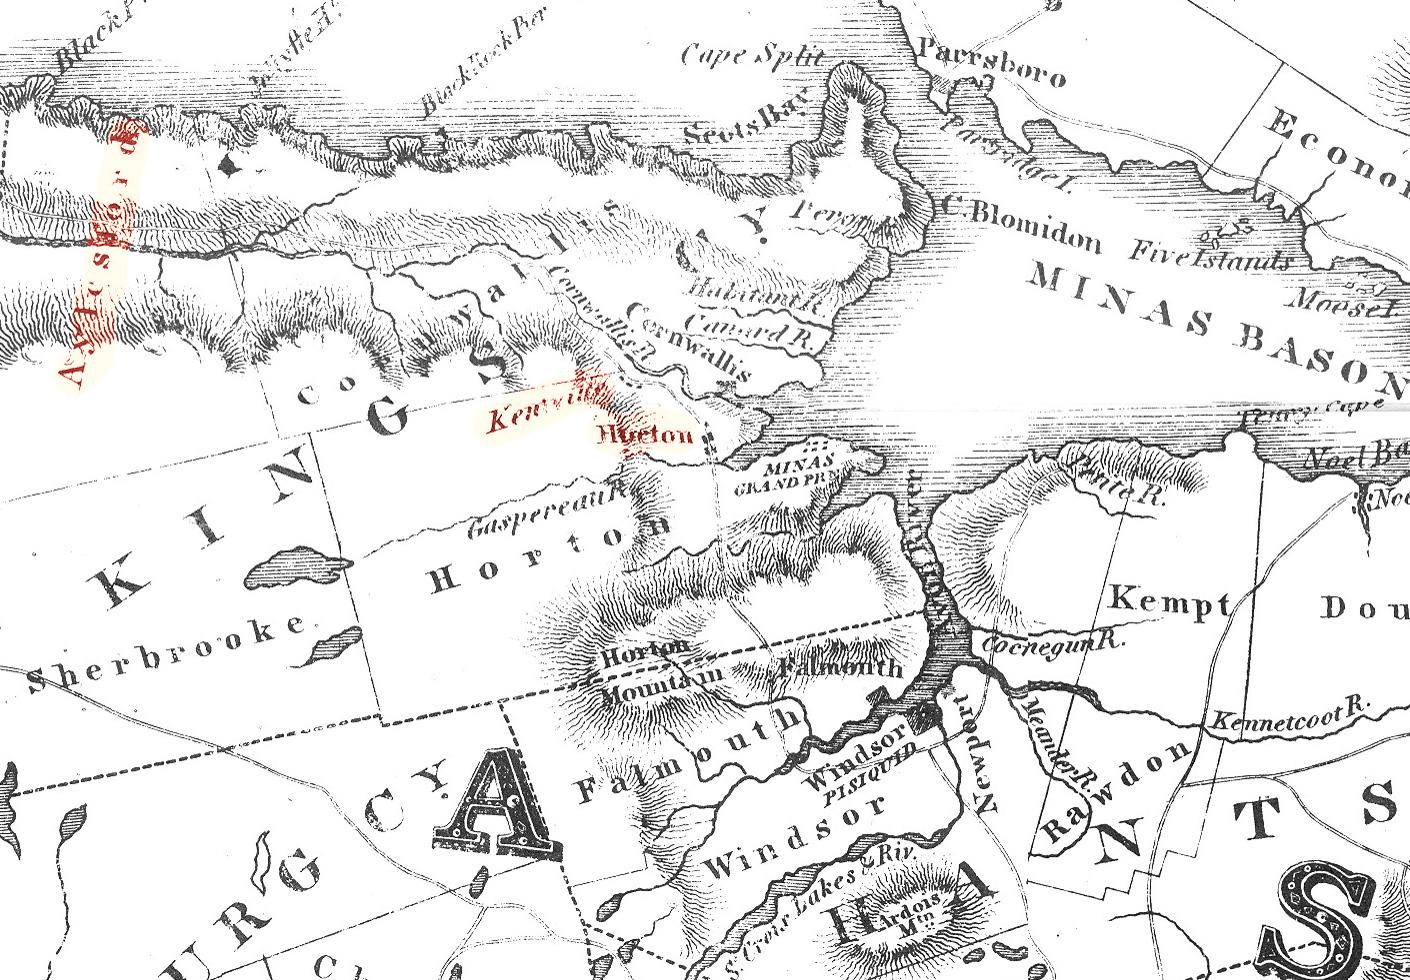 Kings County on 1829 Map of Nova Scotia